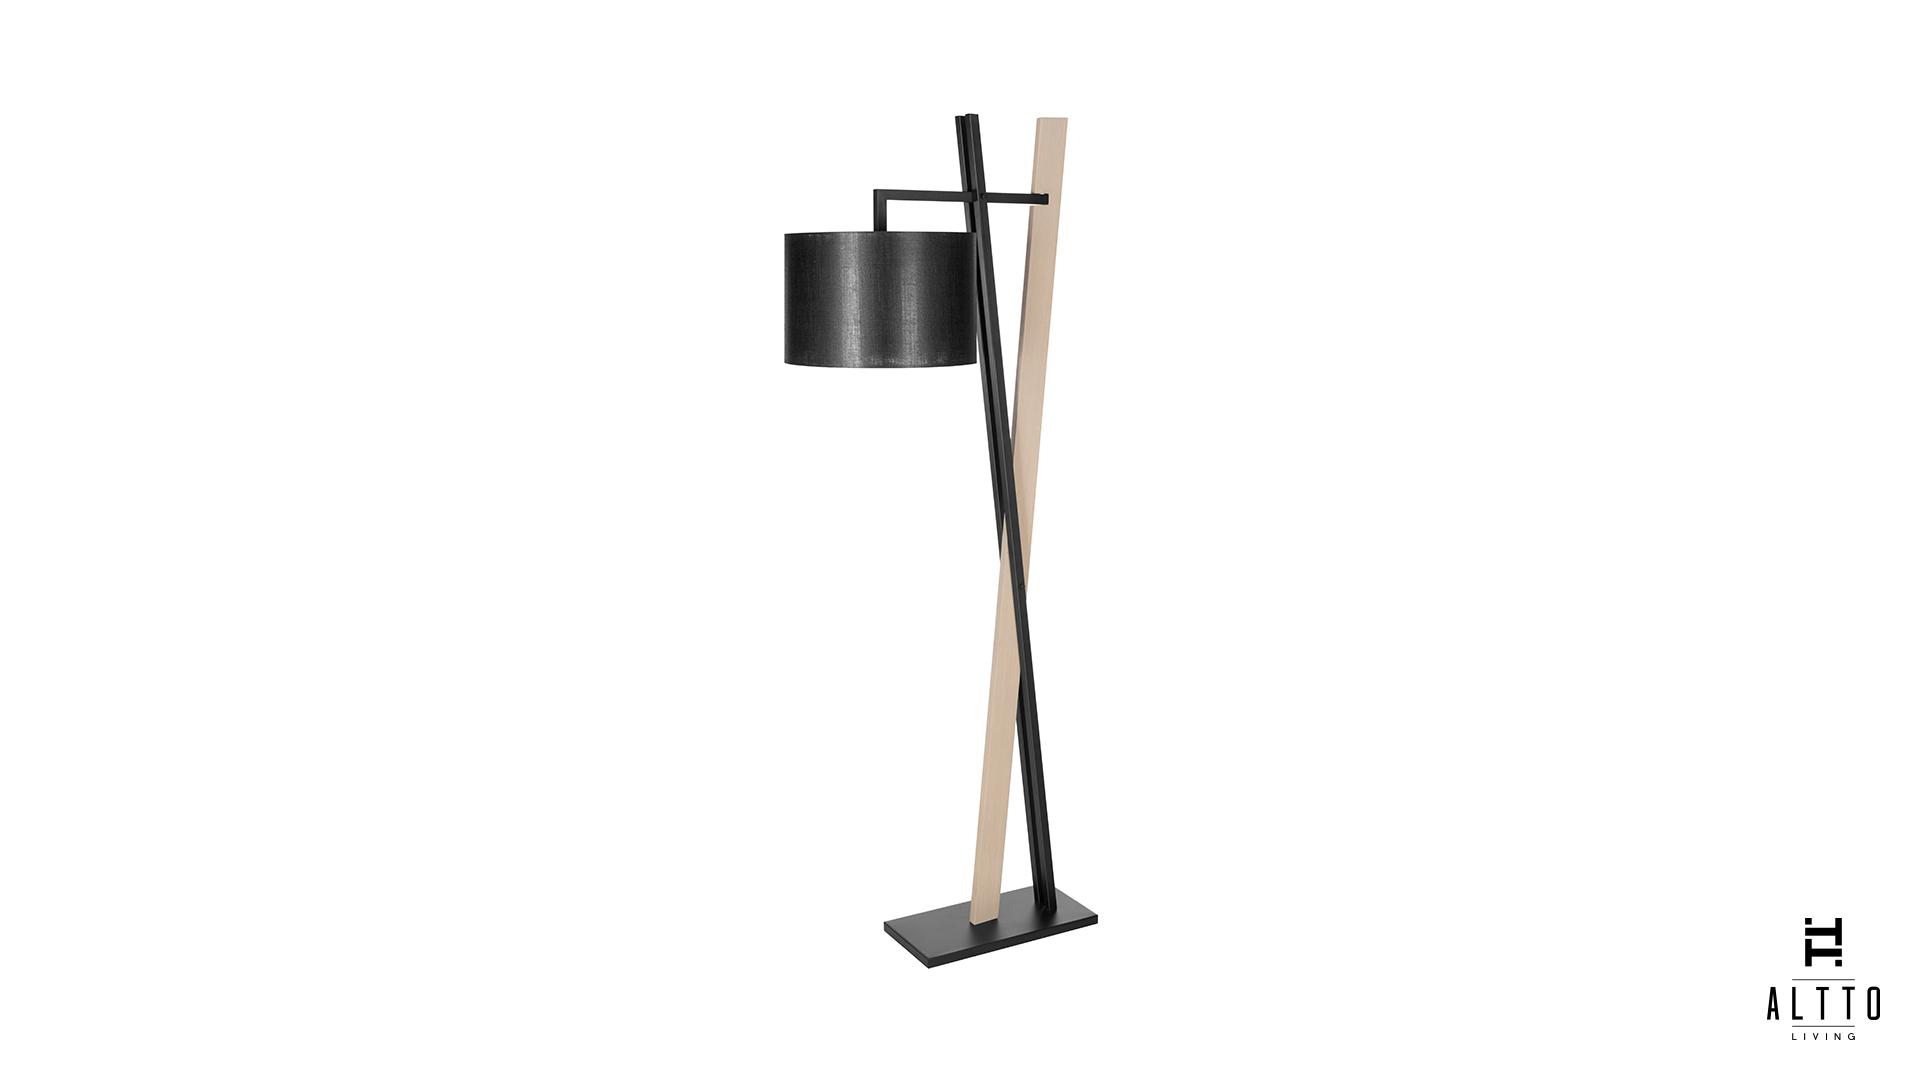 ALTTO | DEUCE Floor Lamp | Modern and cosmopolitan lighting range ...